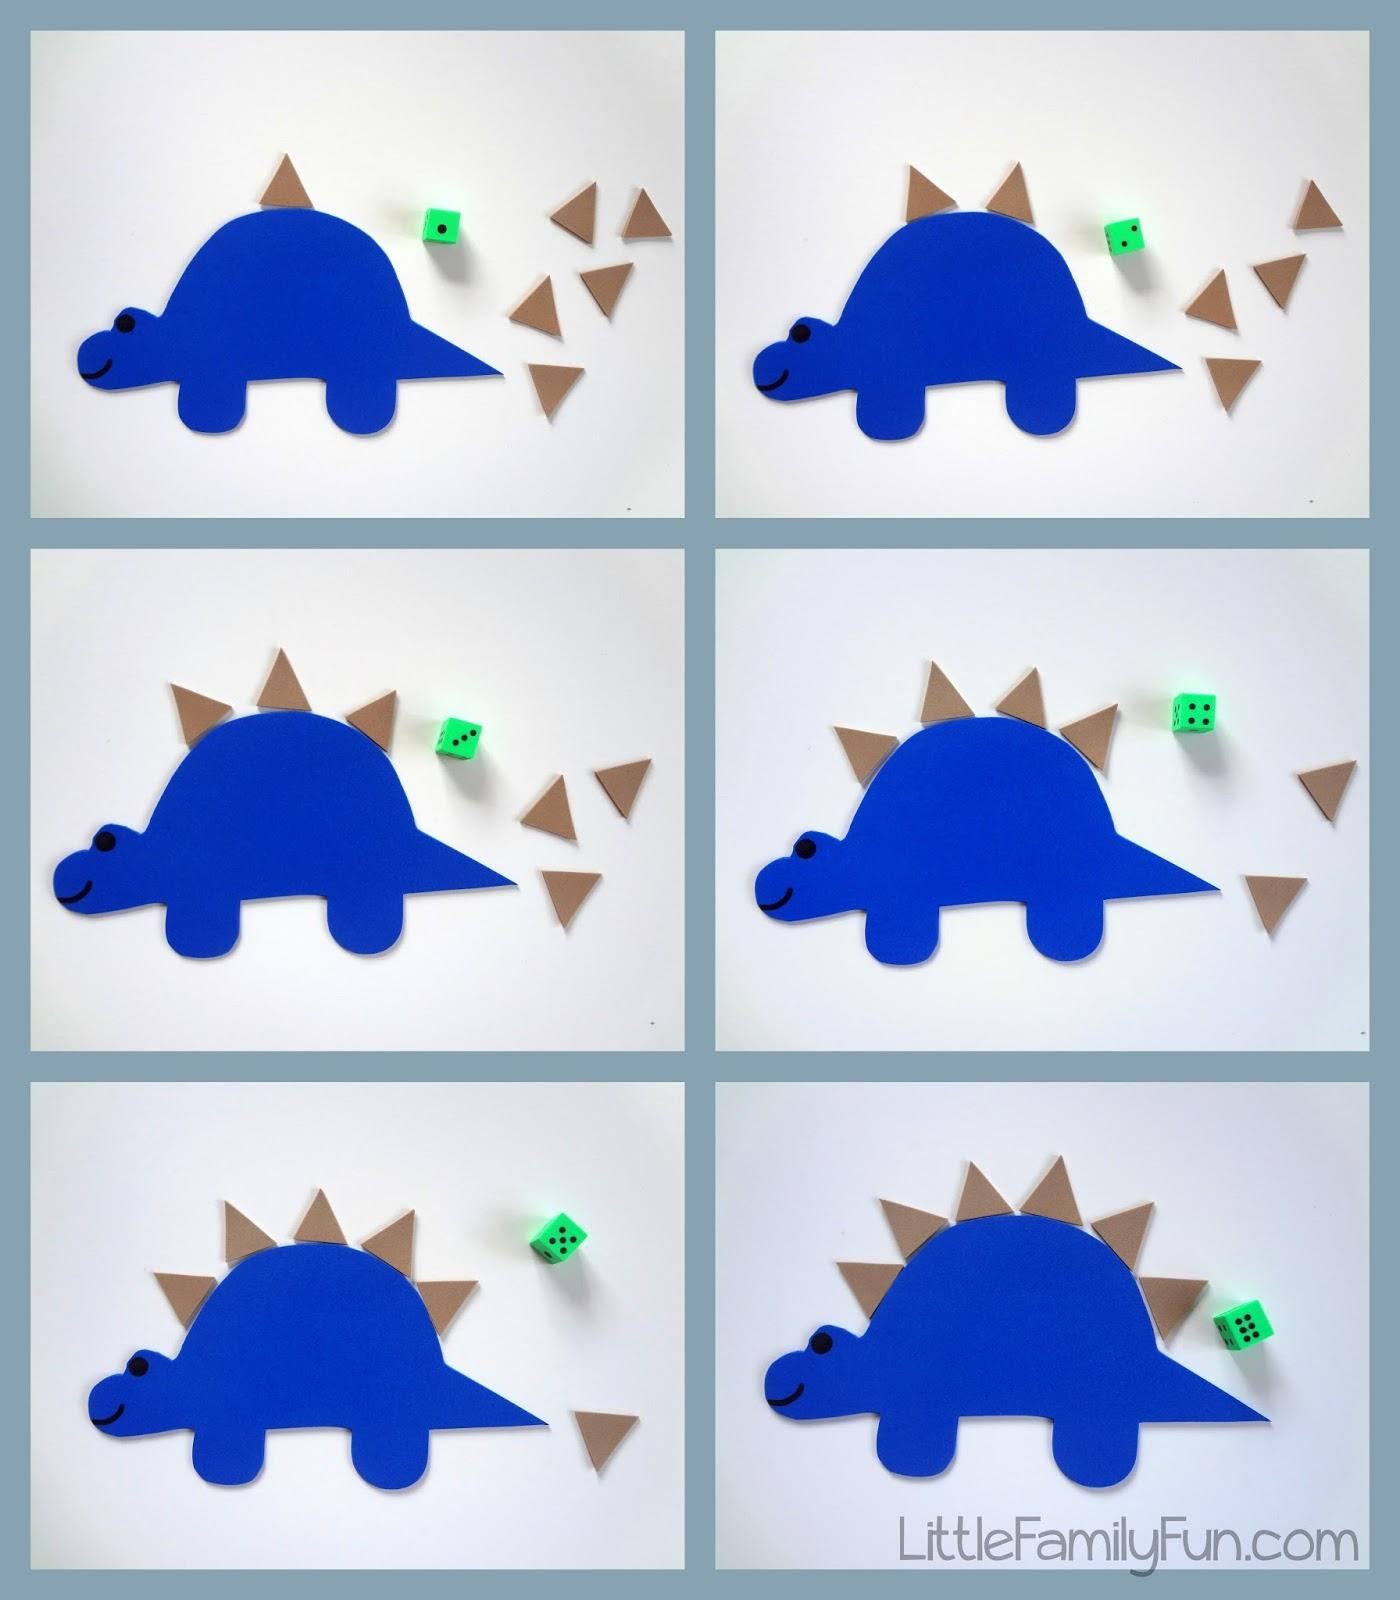 Stegosaurus Counting Game